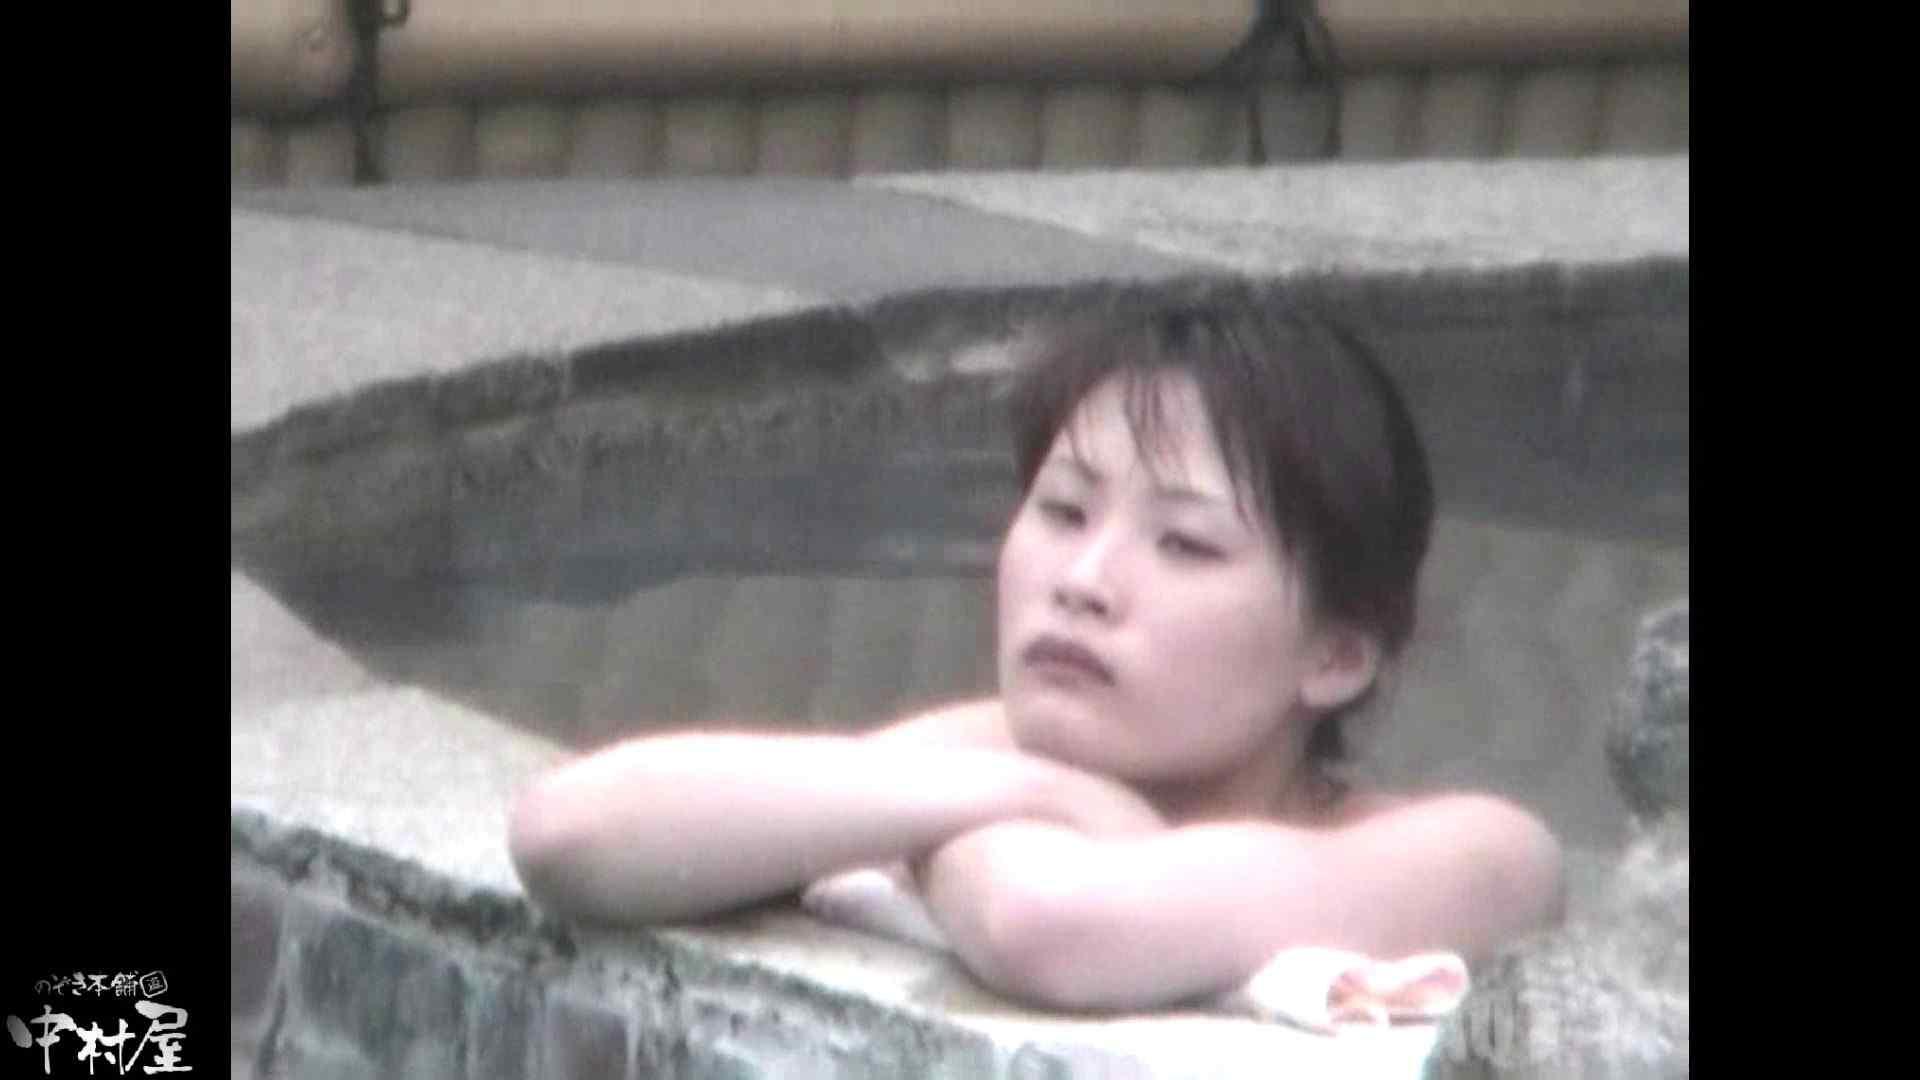 Aquaな露天風呂Vol.878潜入盗撮露天風呂十四判湯 其の三 潜入  110画像 60